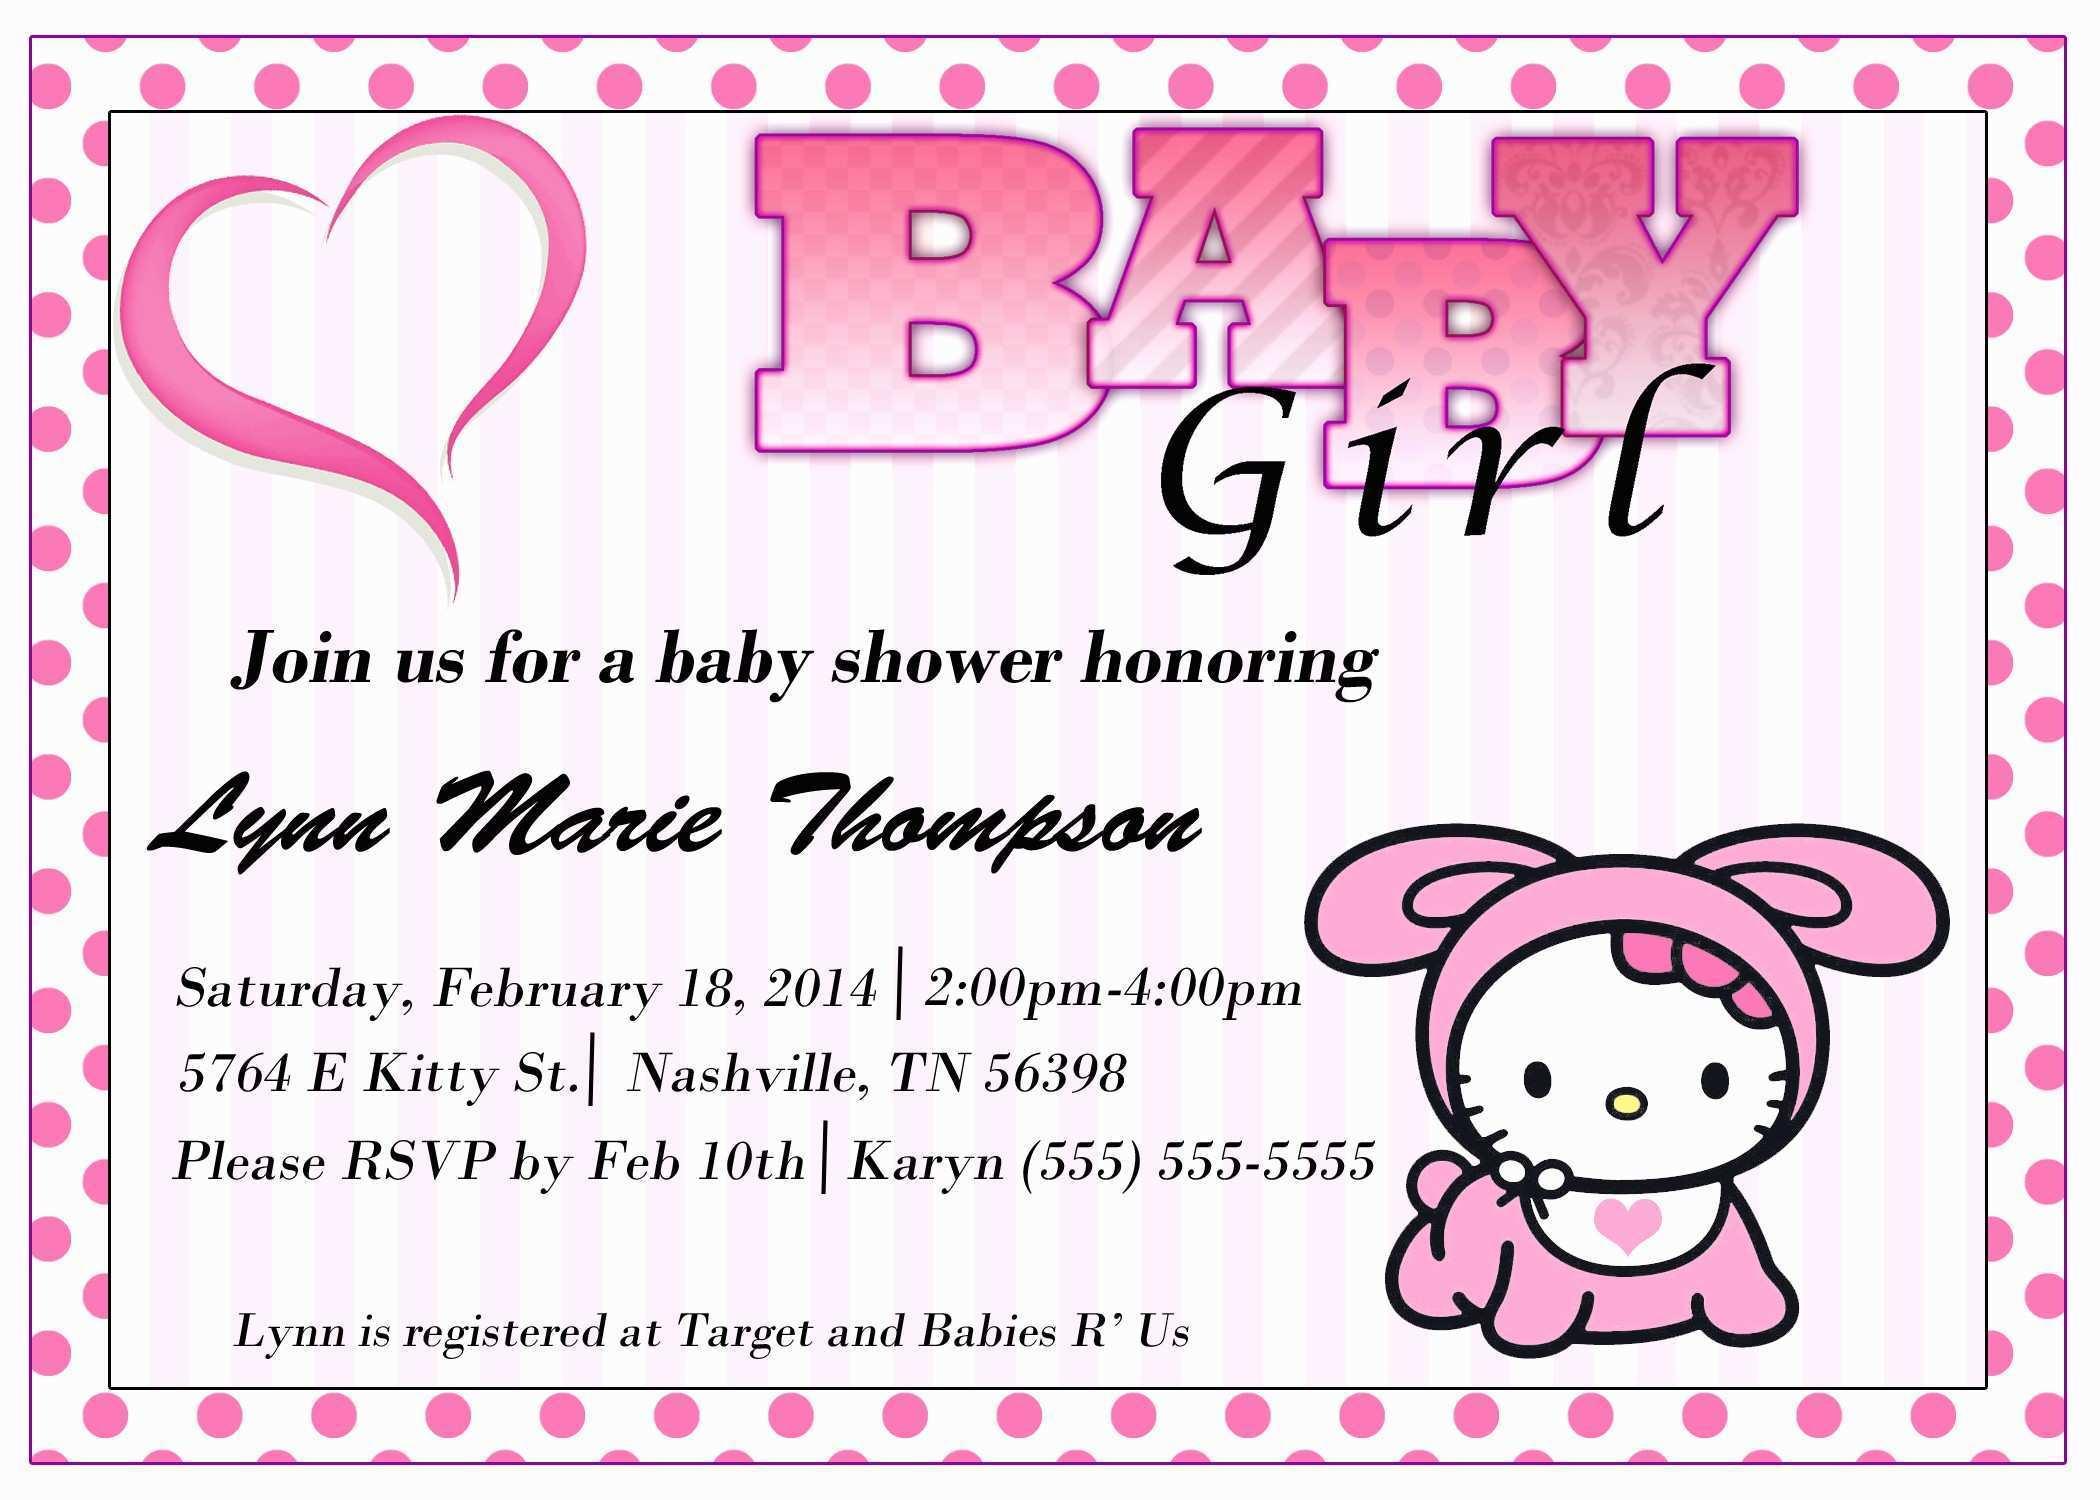 Free Printable Hello Kitty Baby Shower Invitations Pretty Hello - Free Printable Hello Kitty Baby Shower Invitations